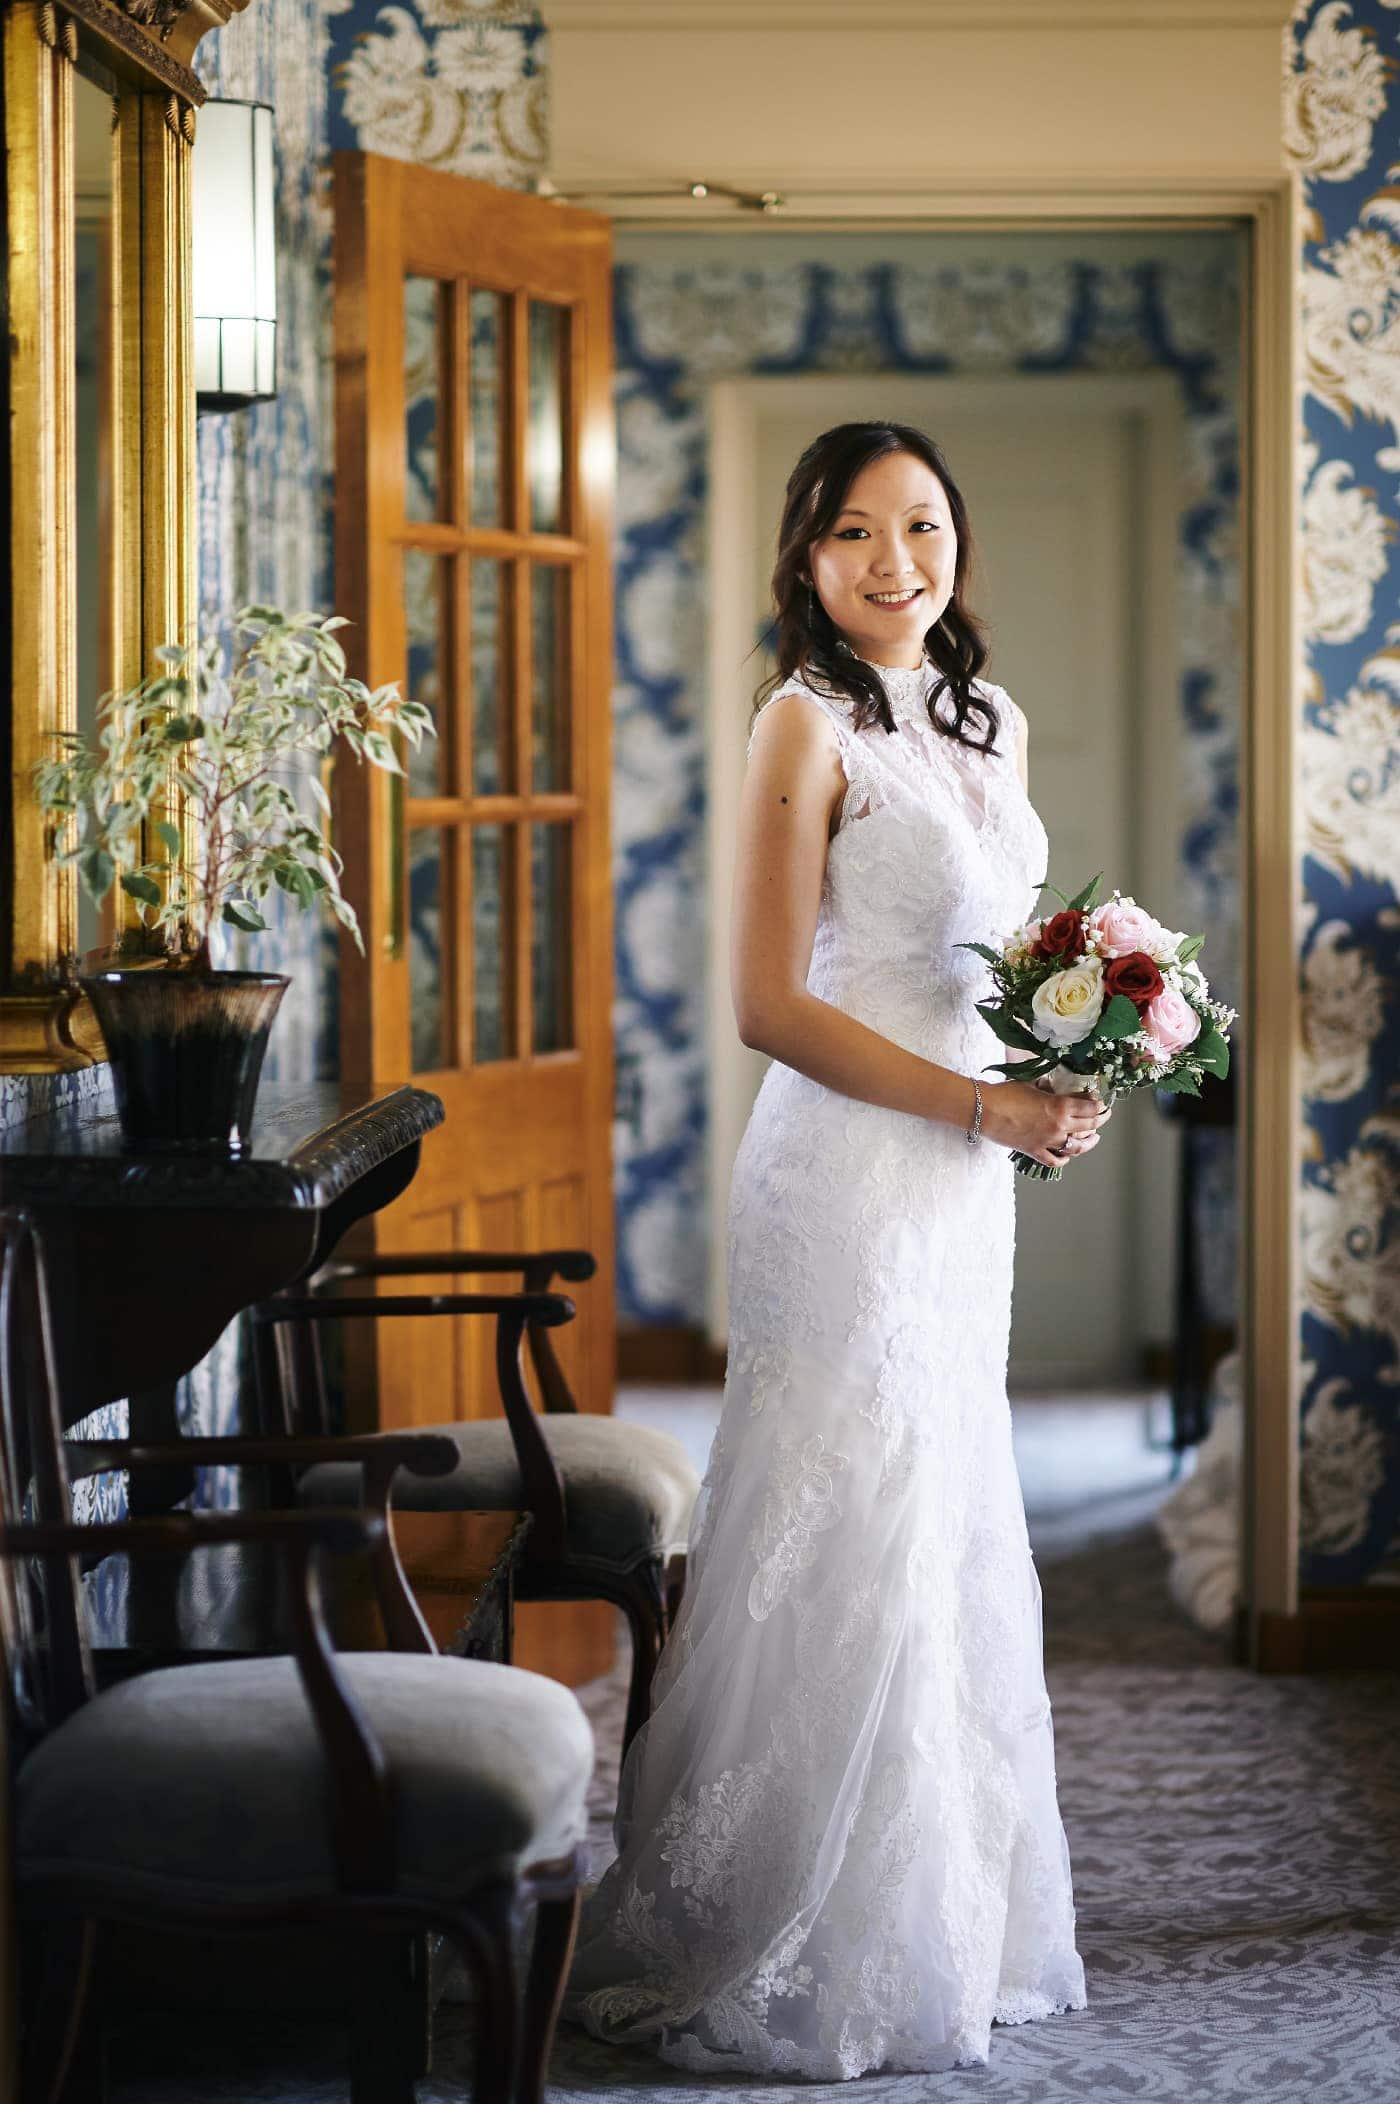 Portrait of bride at Mallory Court